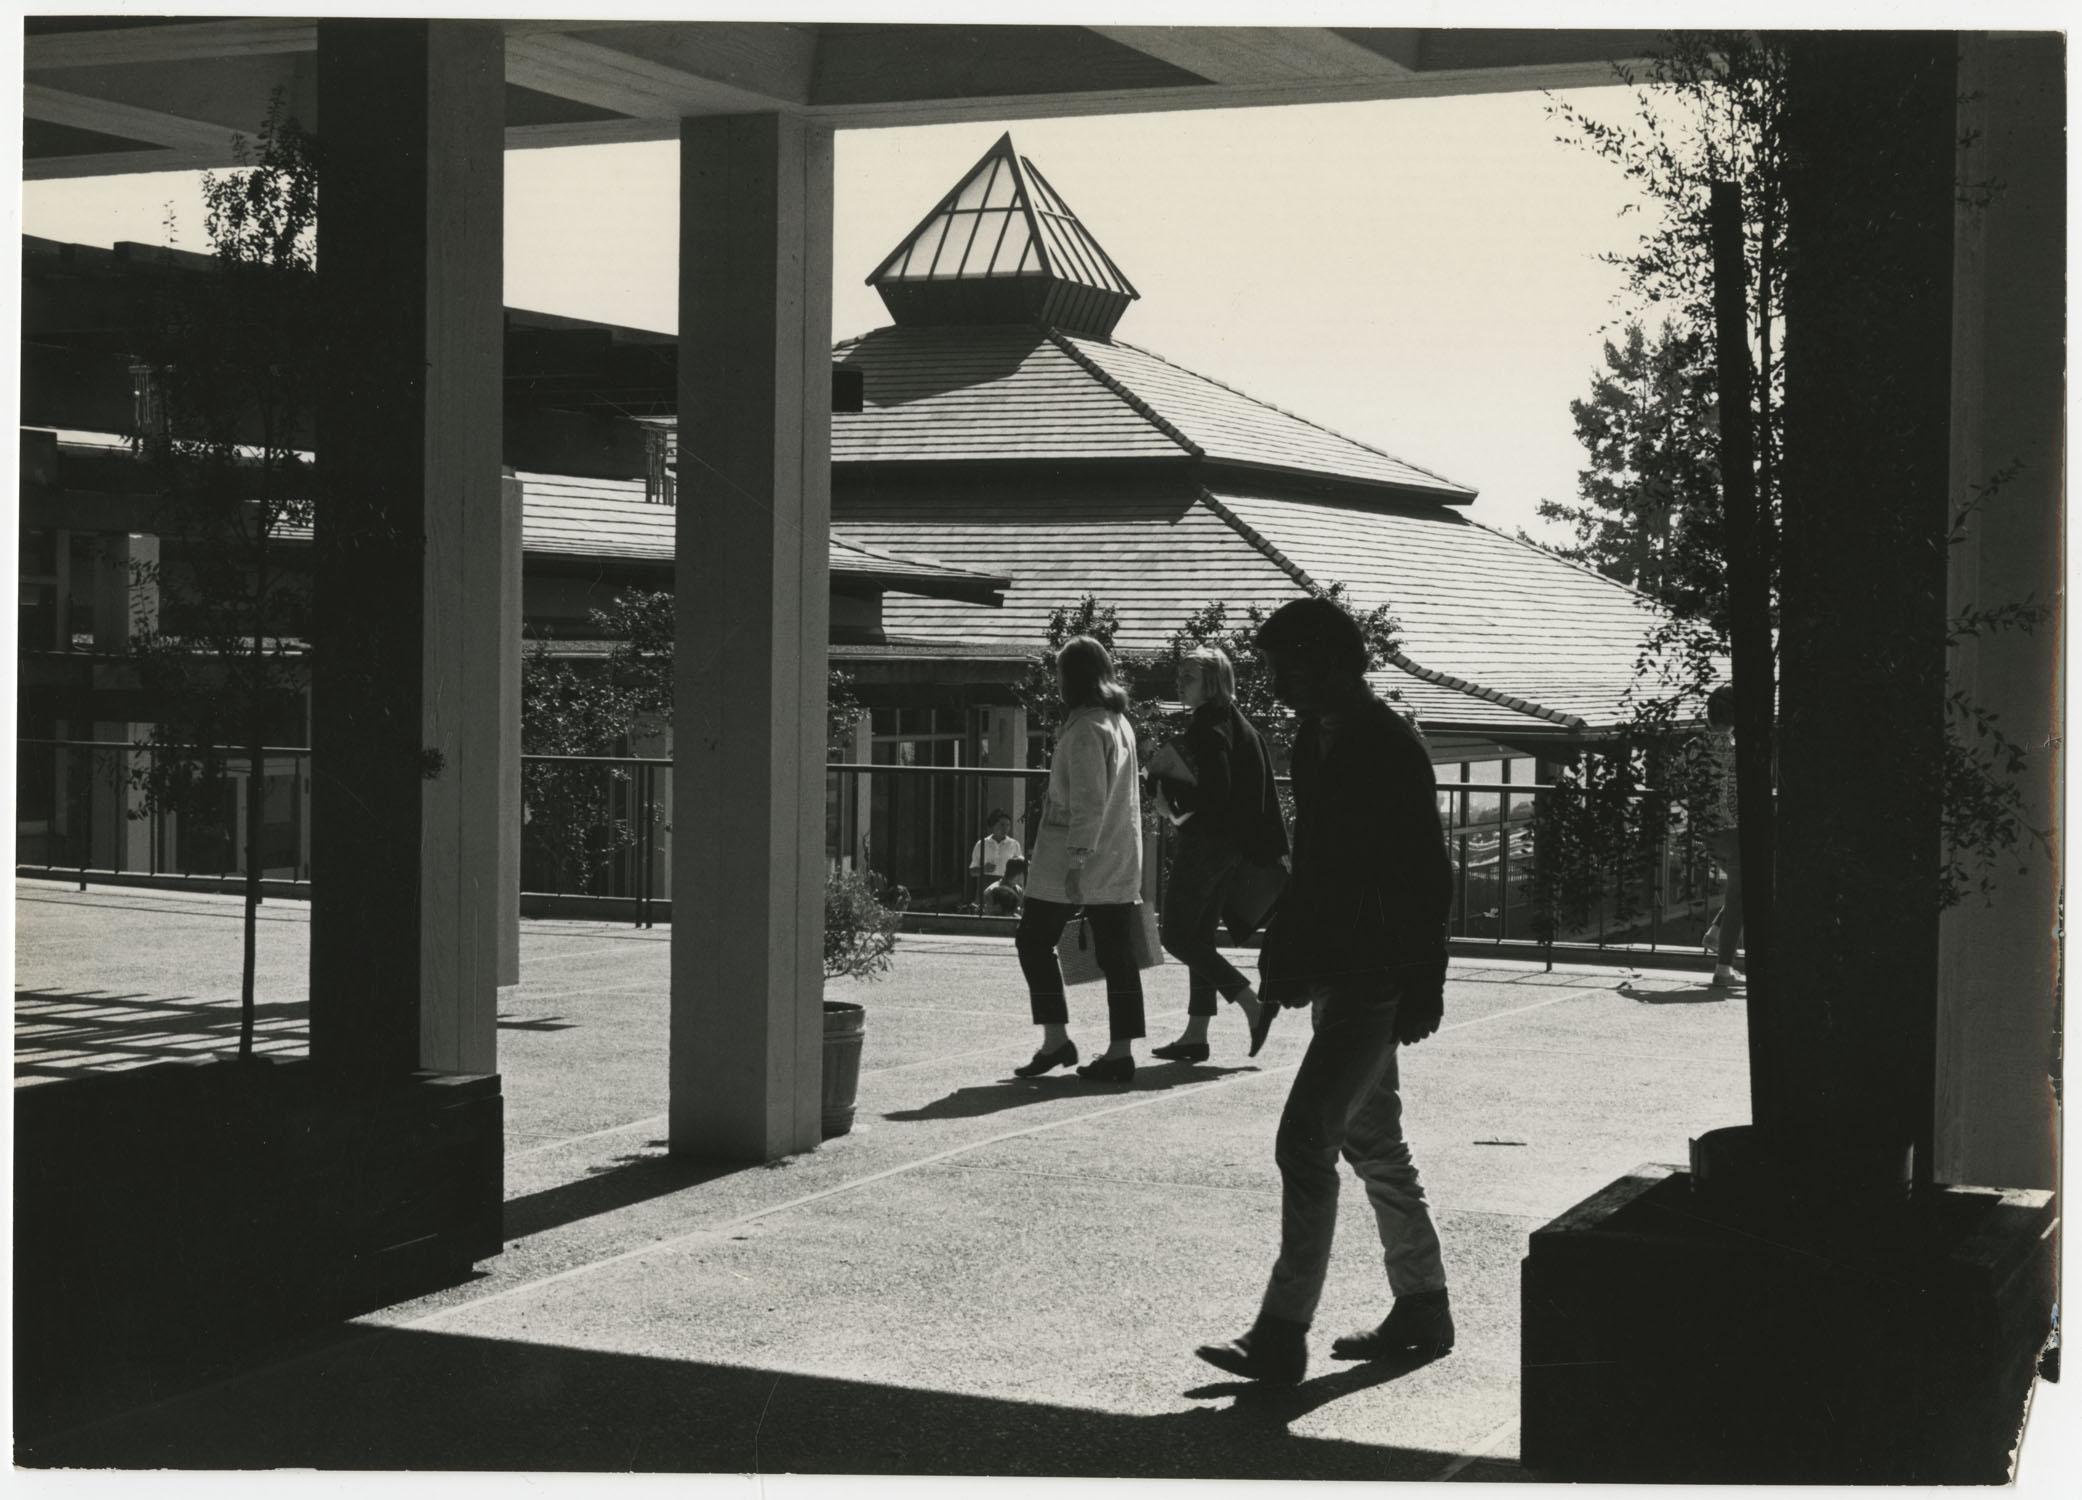 Students Walking on University of California, Santa Cruz Campus